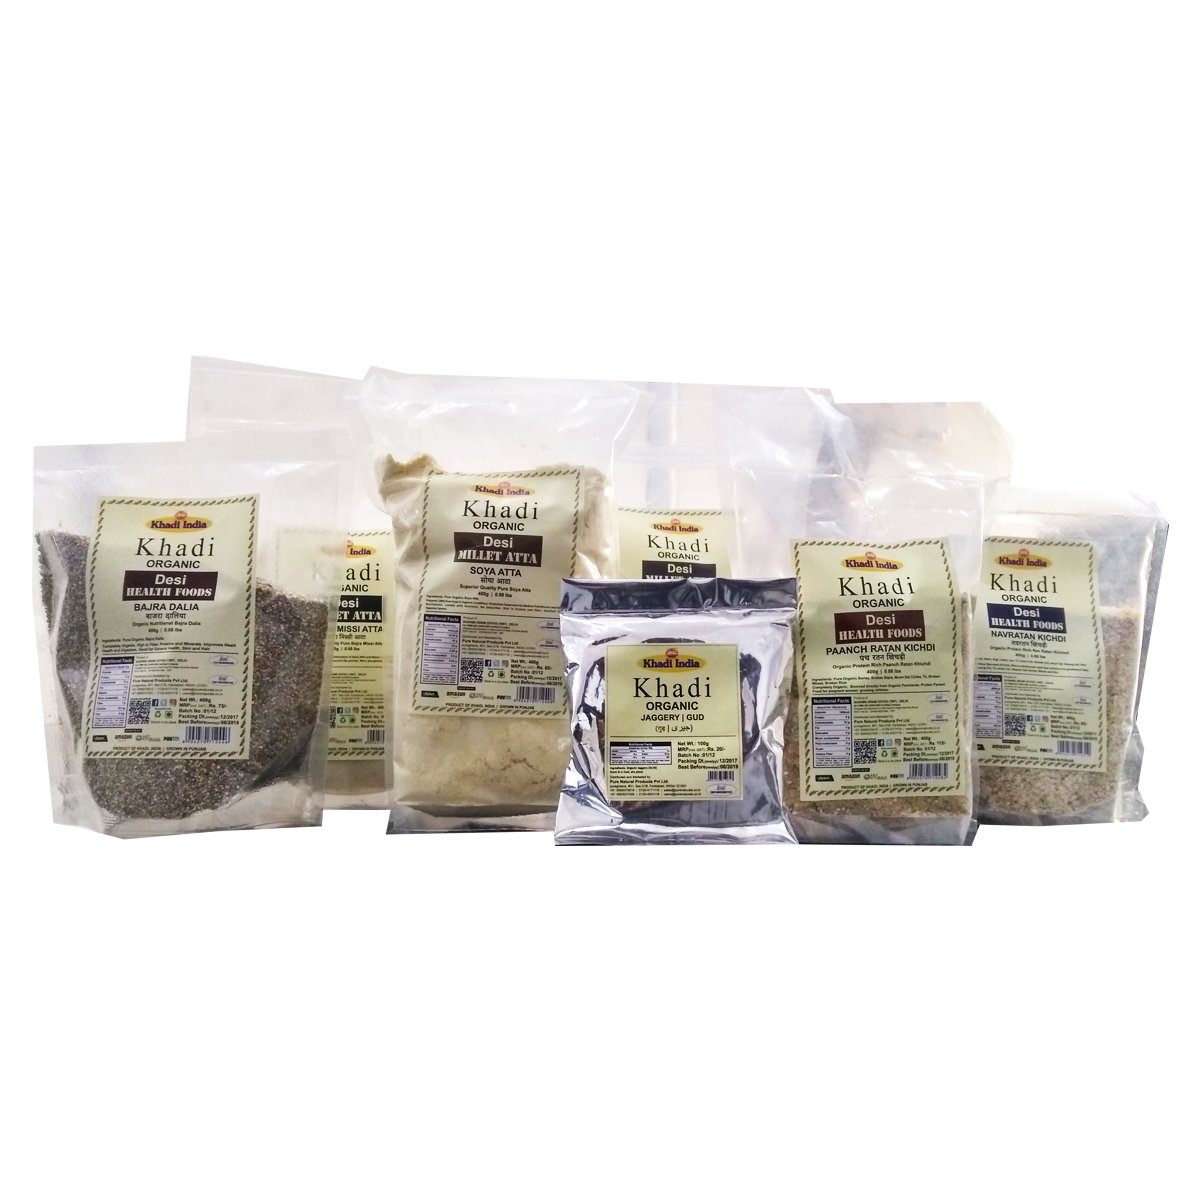 Khadi Organic Bajra Bhog Kit (2.7 Kg) - Winter Special Combo of Bajra Atta (400gm) + Bajra Dalia (400gm) + Bajra Missi Atta (400gm) + Panch Ratan Khichdi (400gm) + Nav Ratan Khichdi (400gm) + Soya Att